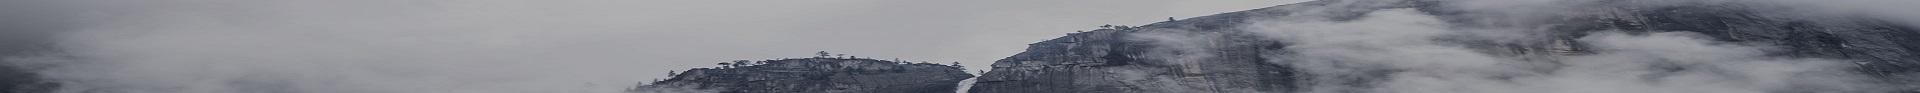 AxPro Draadloze Sirenes